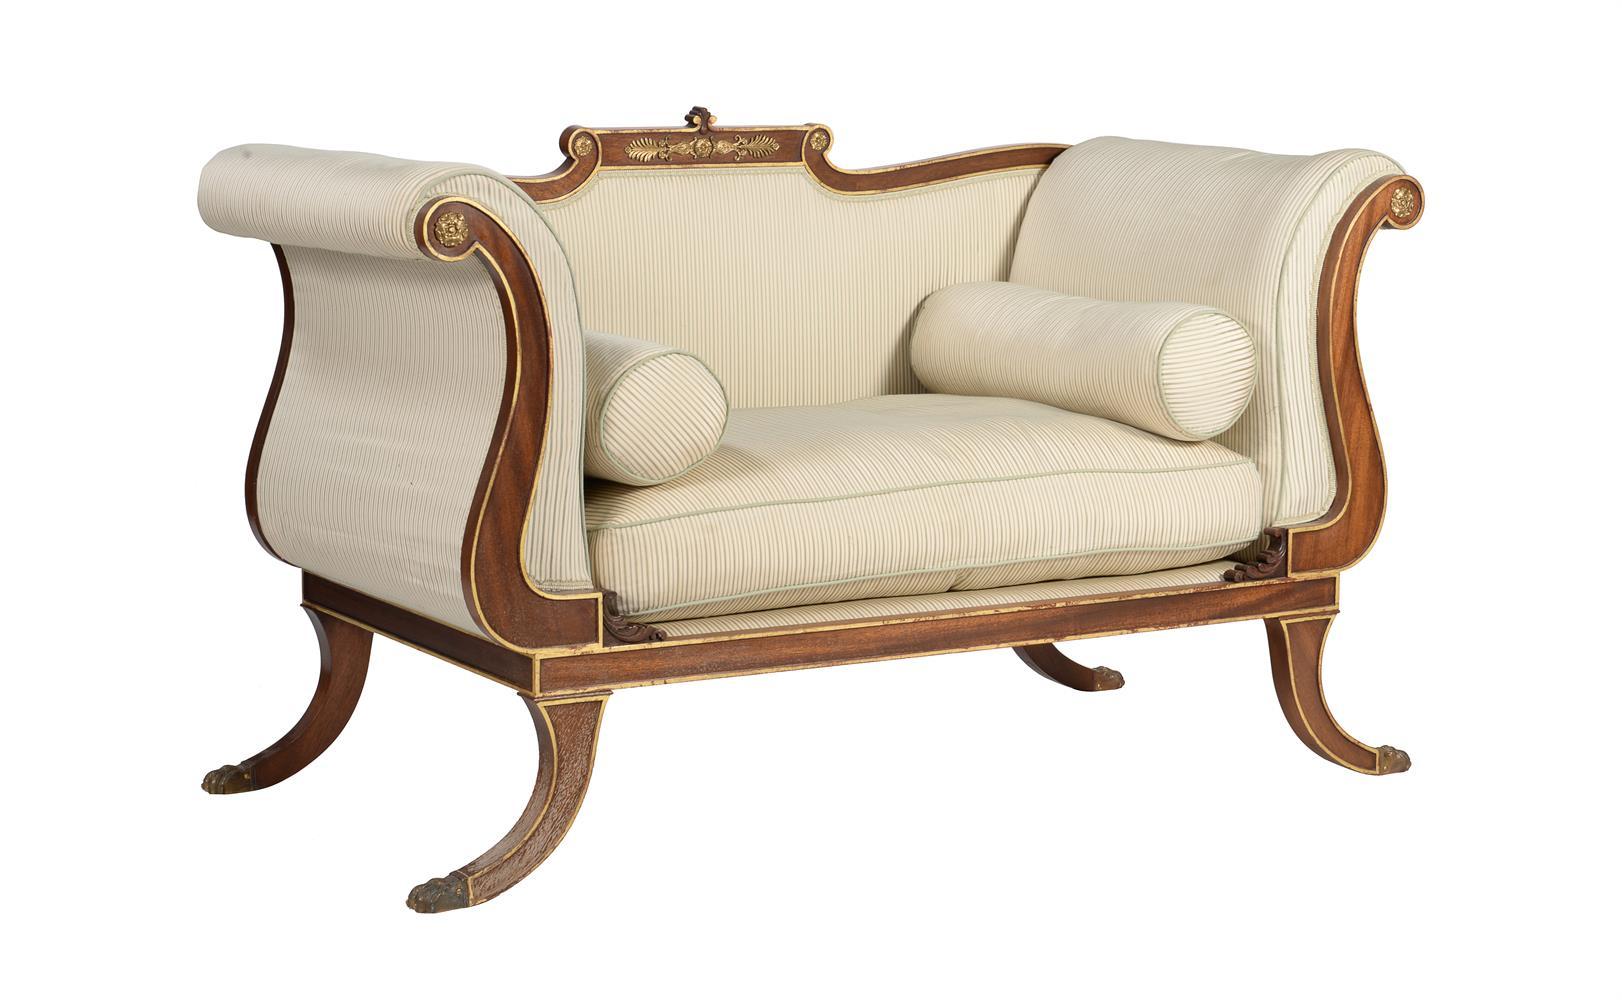 A mahogany and parcel gilt sofa